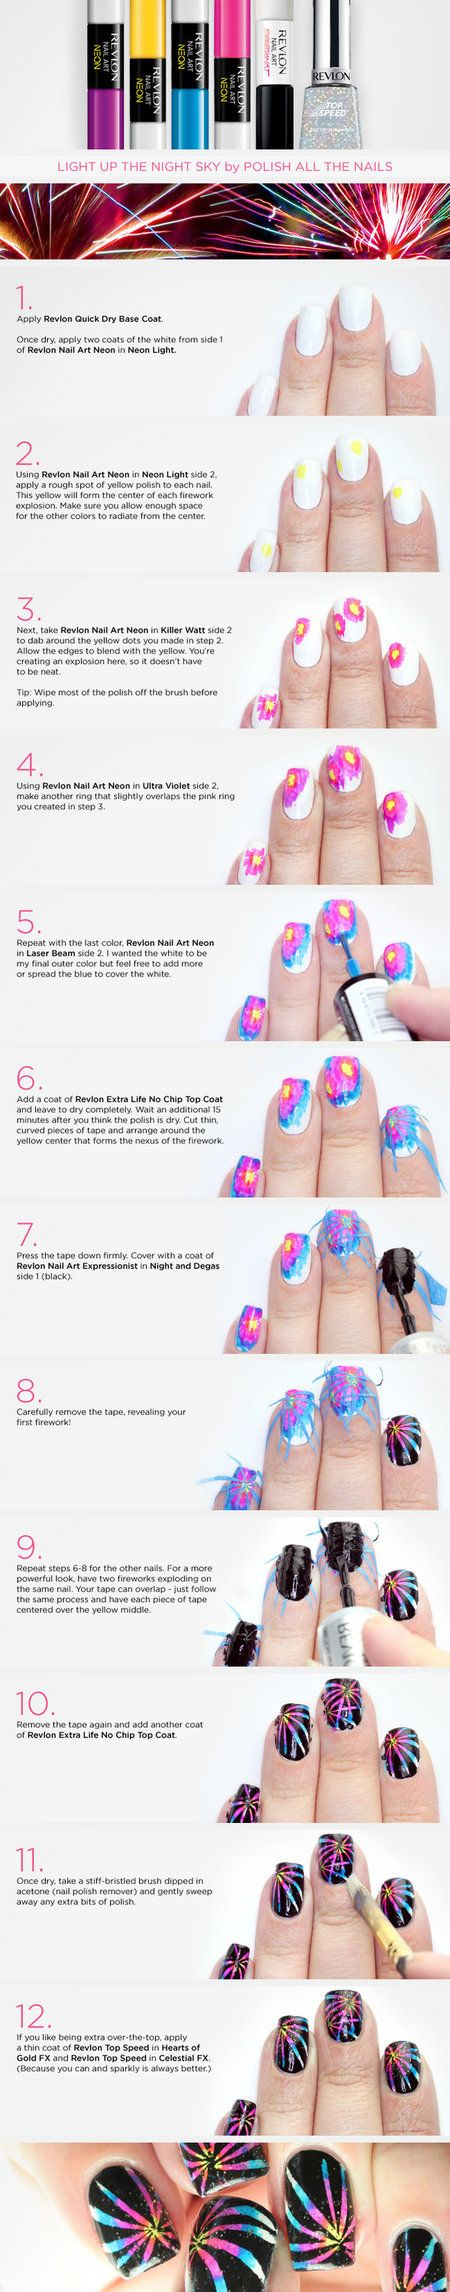 Best 25+ No chip polish ideas on Pinterest | No chip nail polish ...